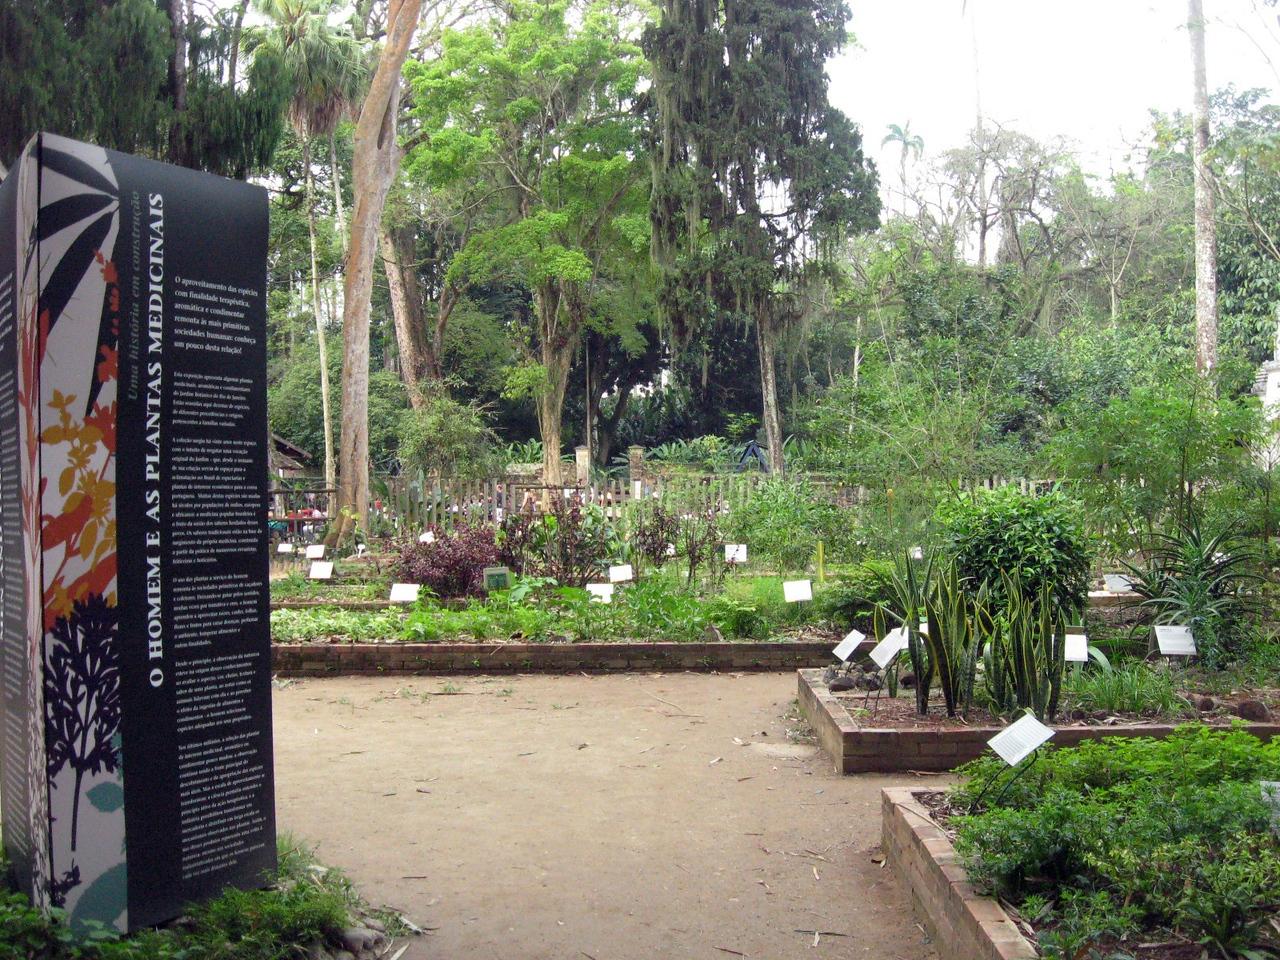 Colecao de Plantas Medicinais (Medicinal Plants Collection)